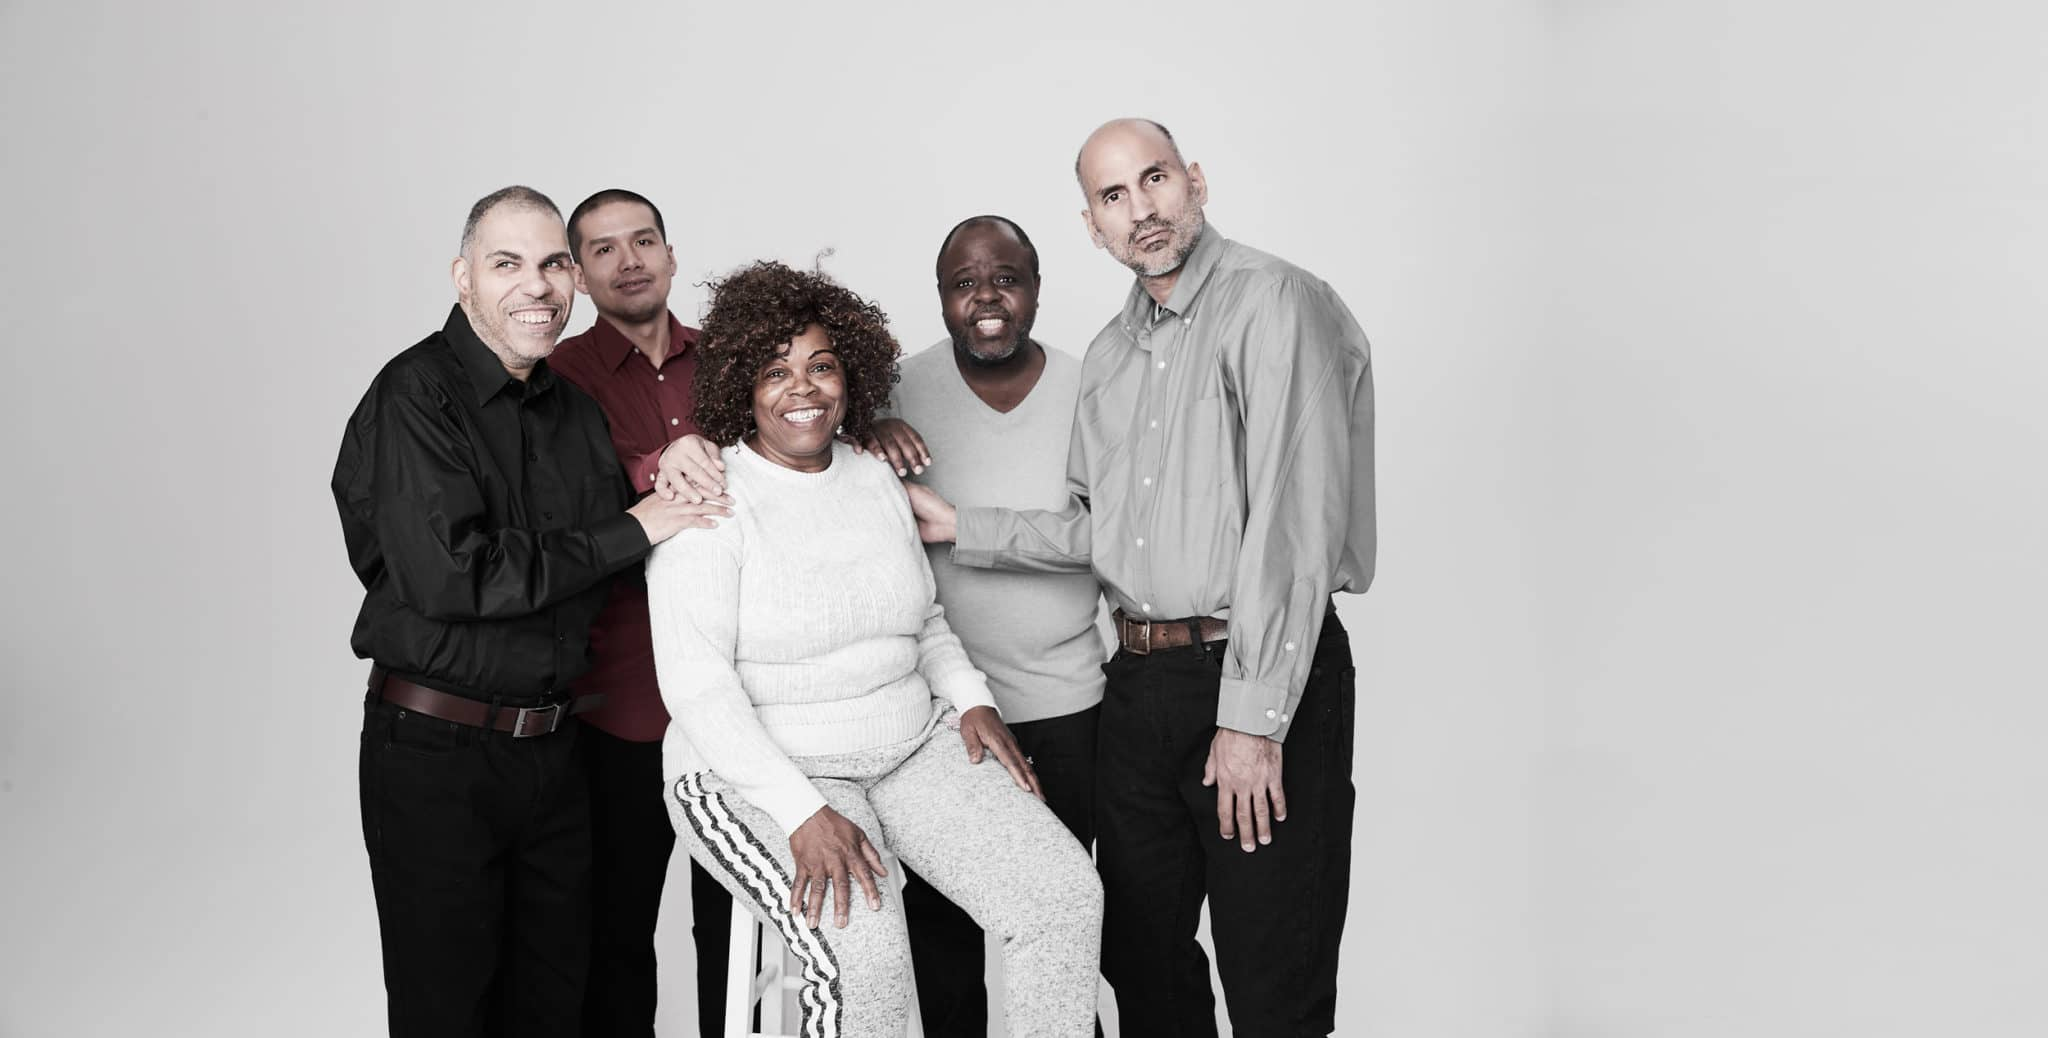 Jaymarck Manicado group photo with 5 people